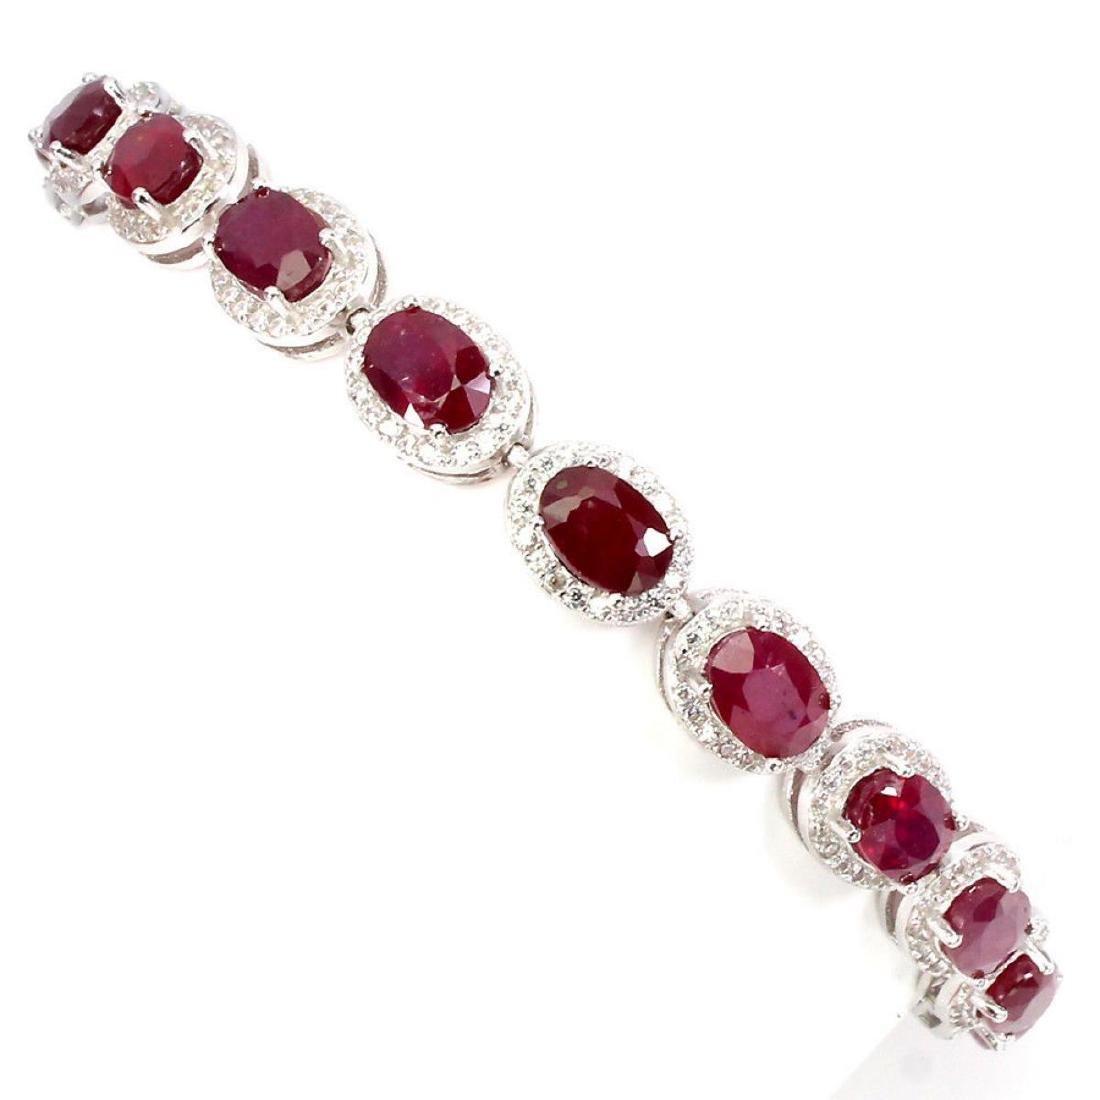 Natural Oval 7x5 Mm Blood Red Ruby Bracelet